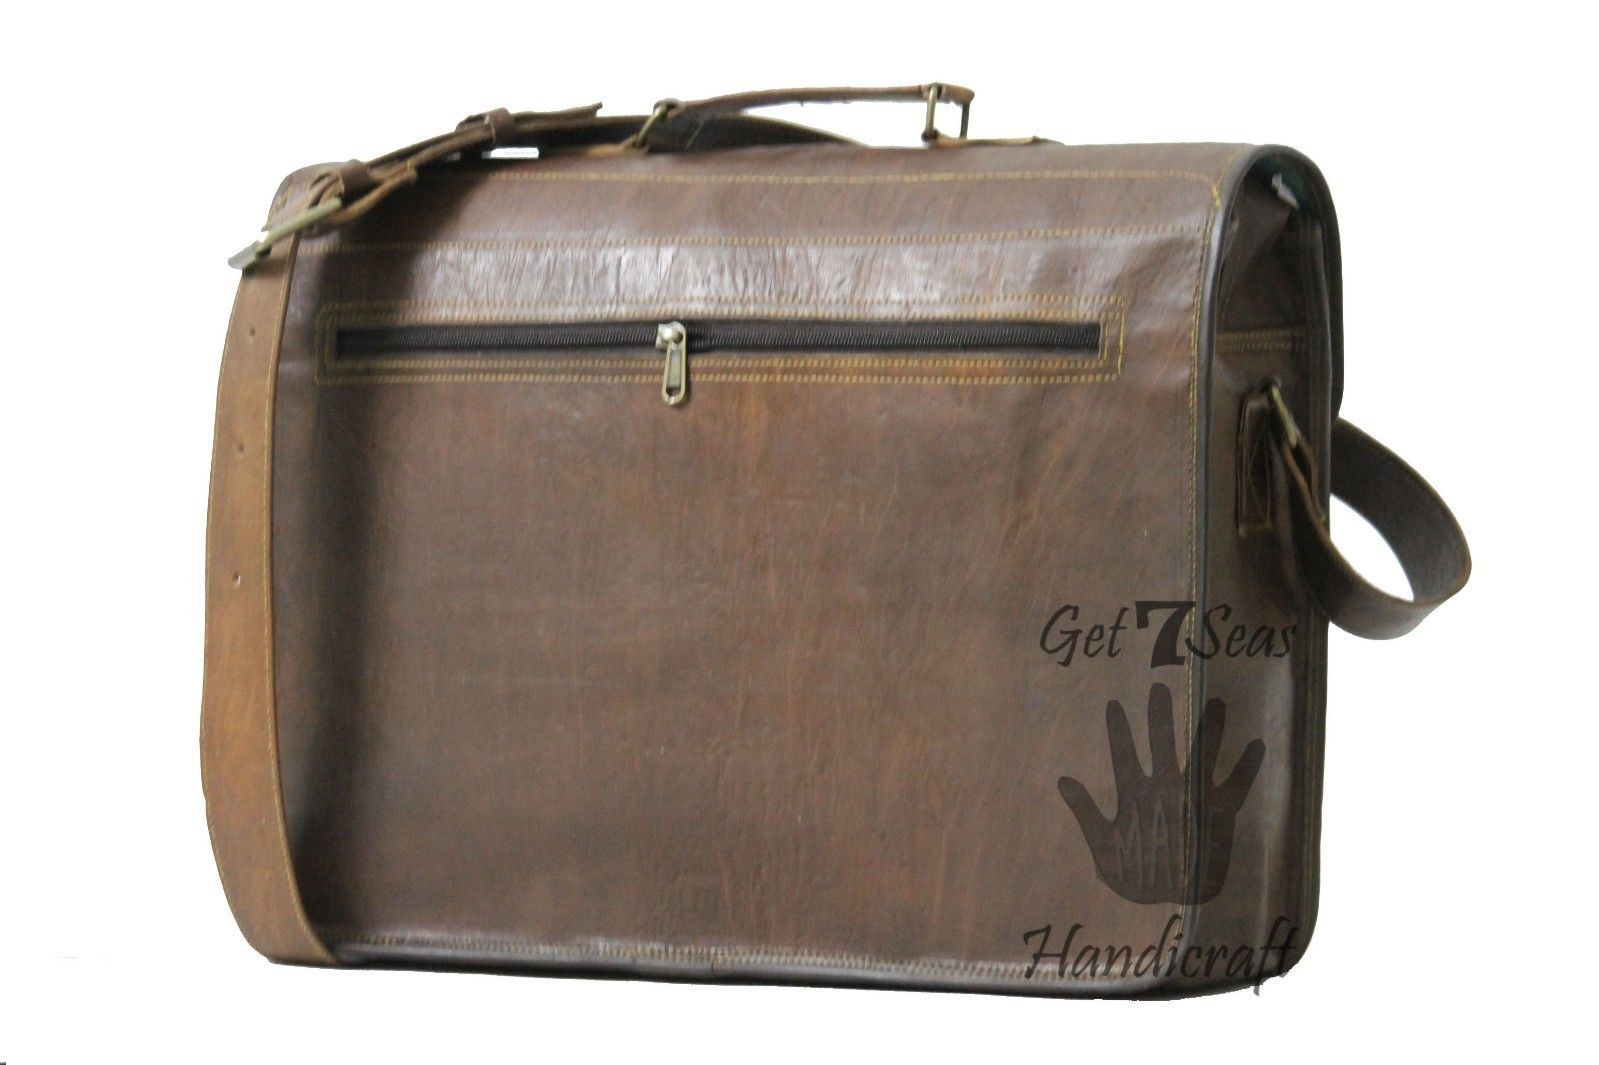 Leather computer bag men's shoulder laptop women satchel briefcase gwnuine Bags image 4